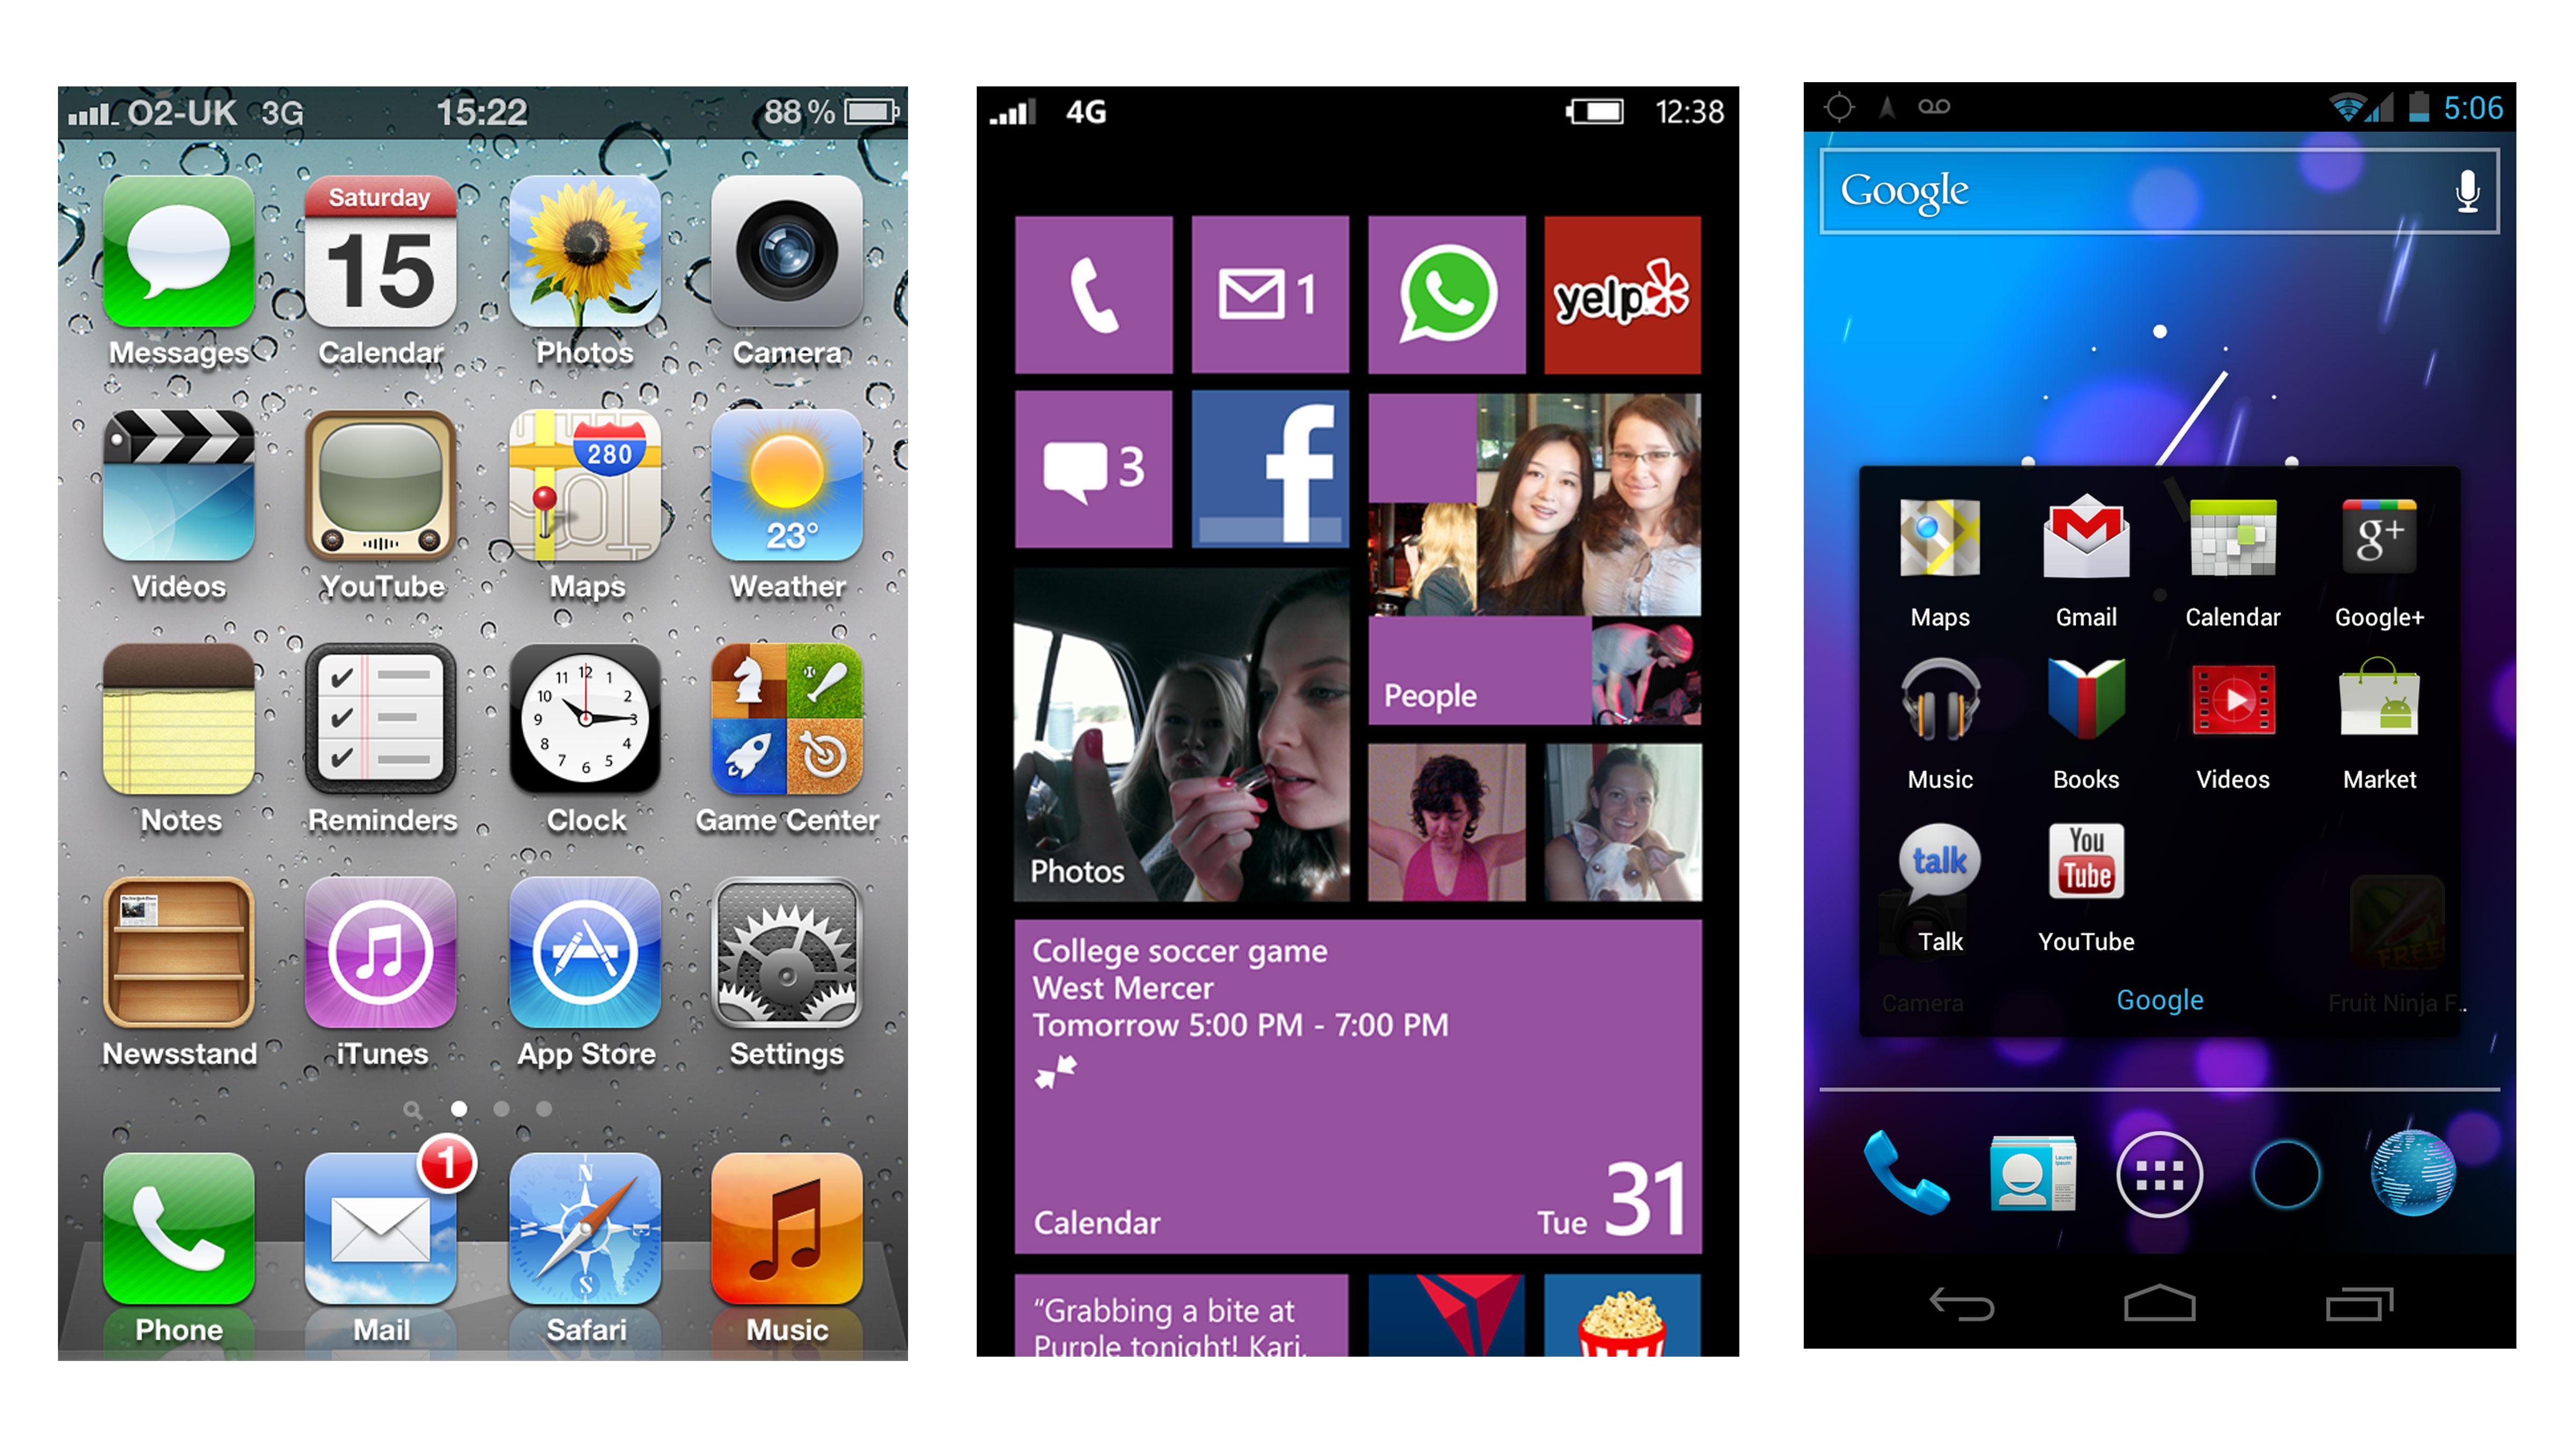 Android 4 1 vs Windows Phone 8 vs iOS 6 | TechRadar